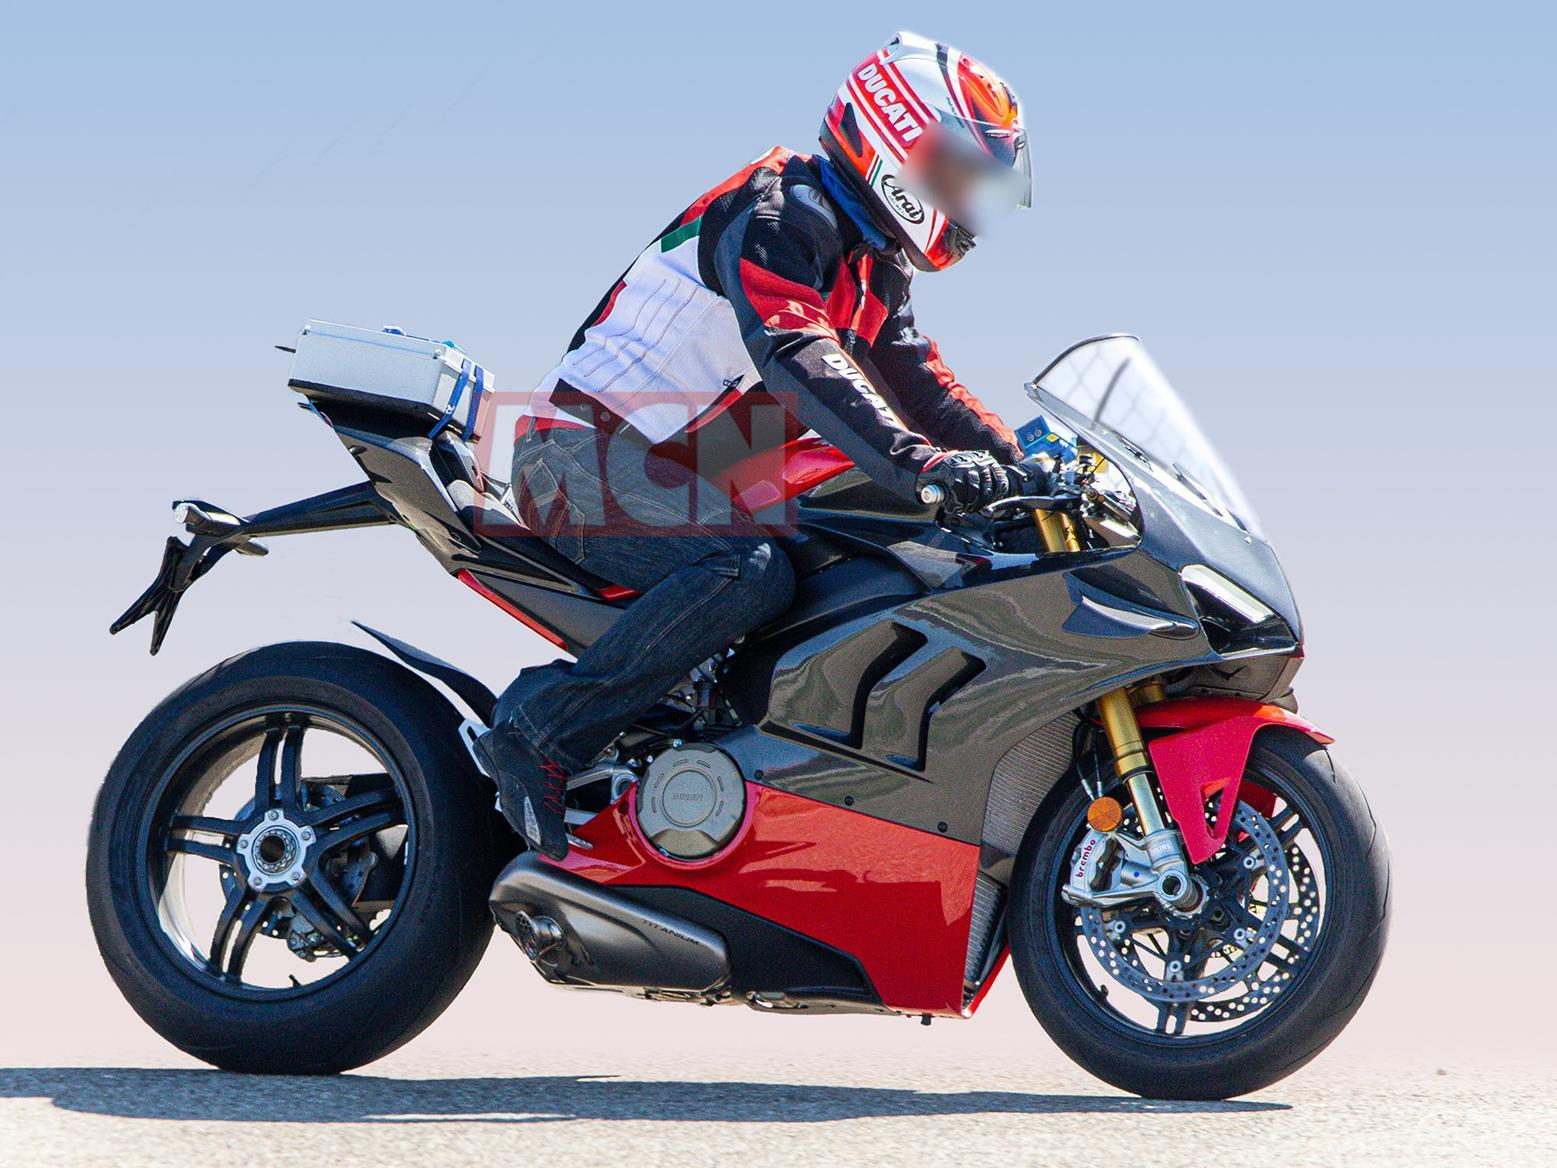 Special lightweight Ducati Panigale V4 Superleggera spied